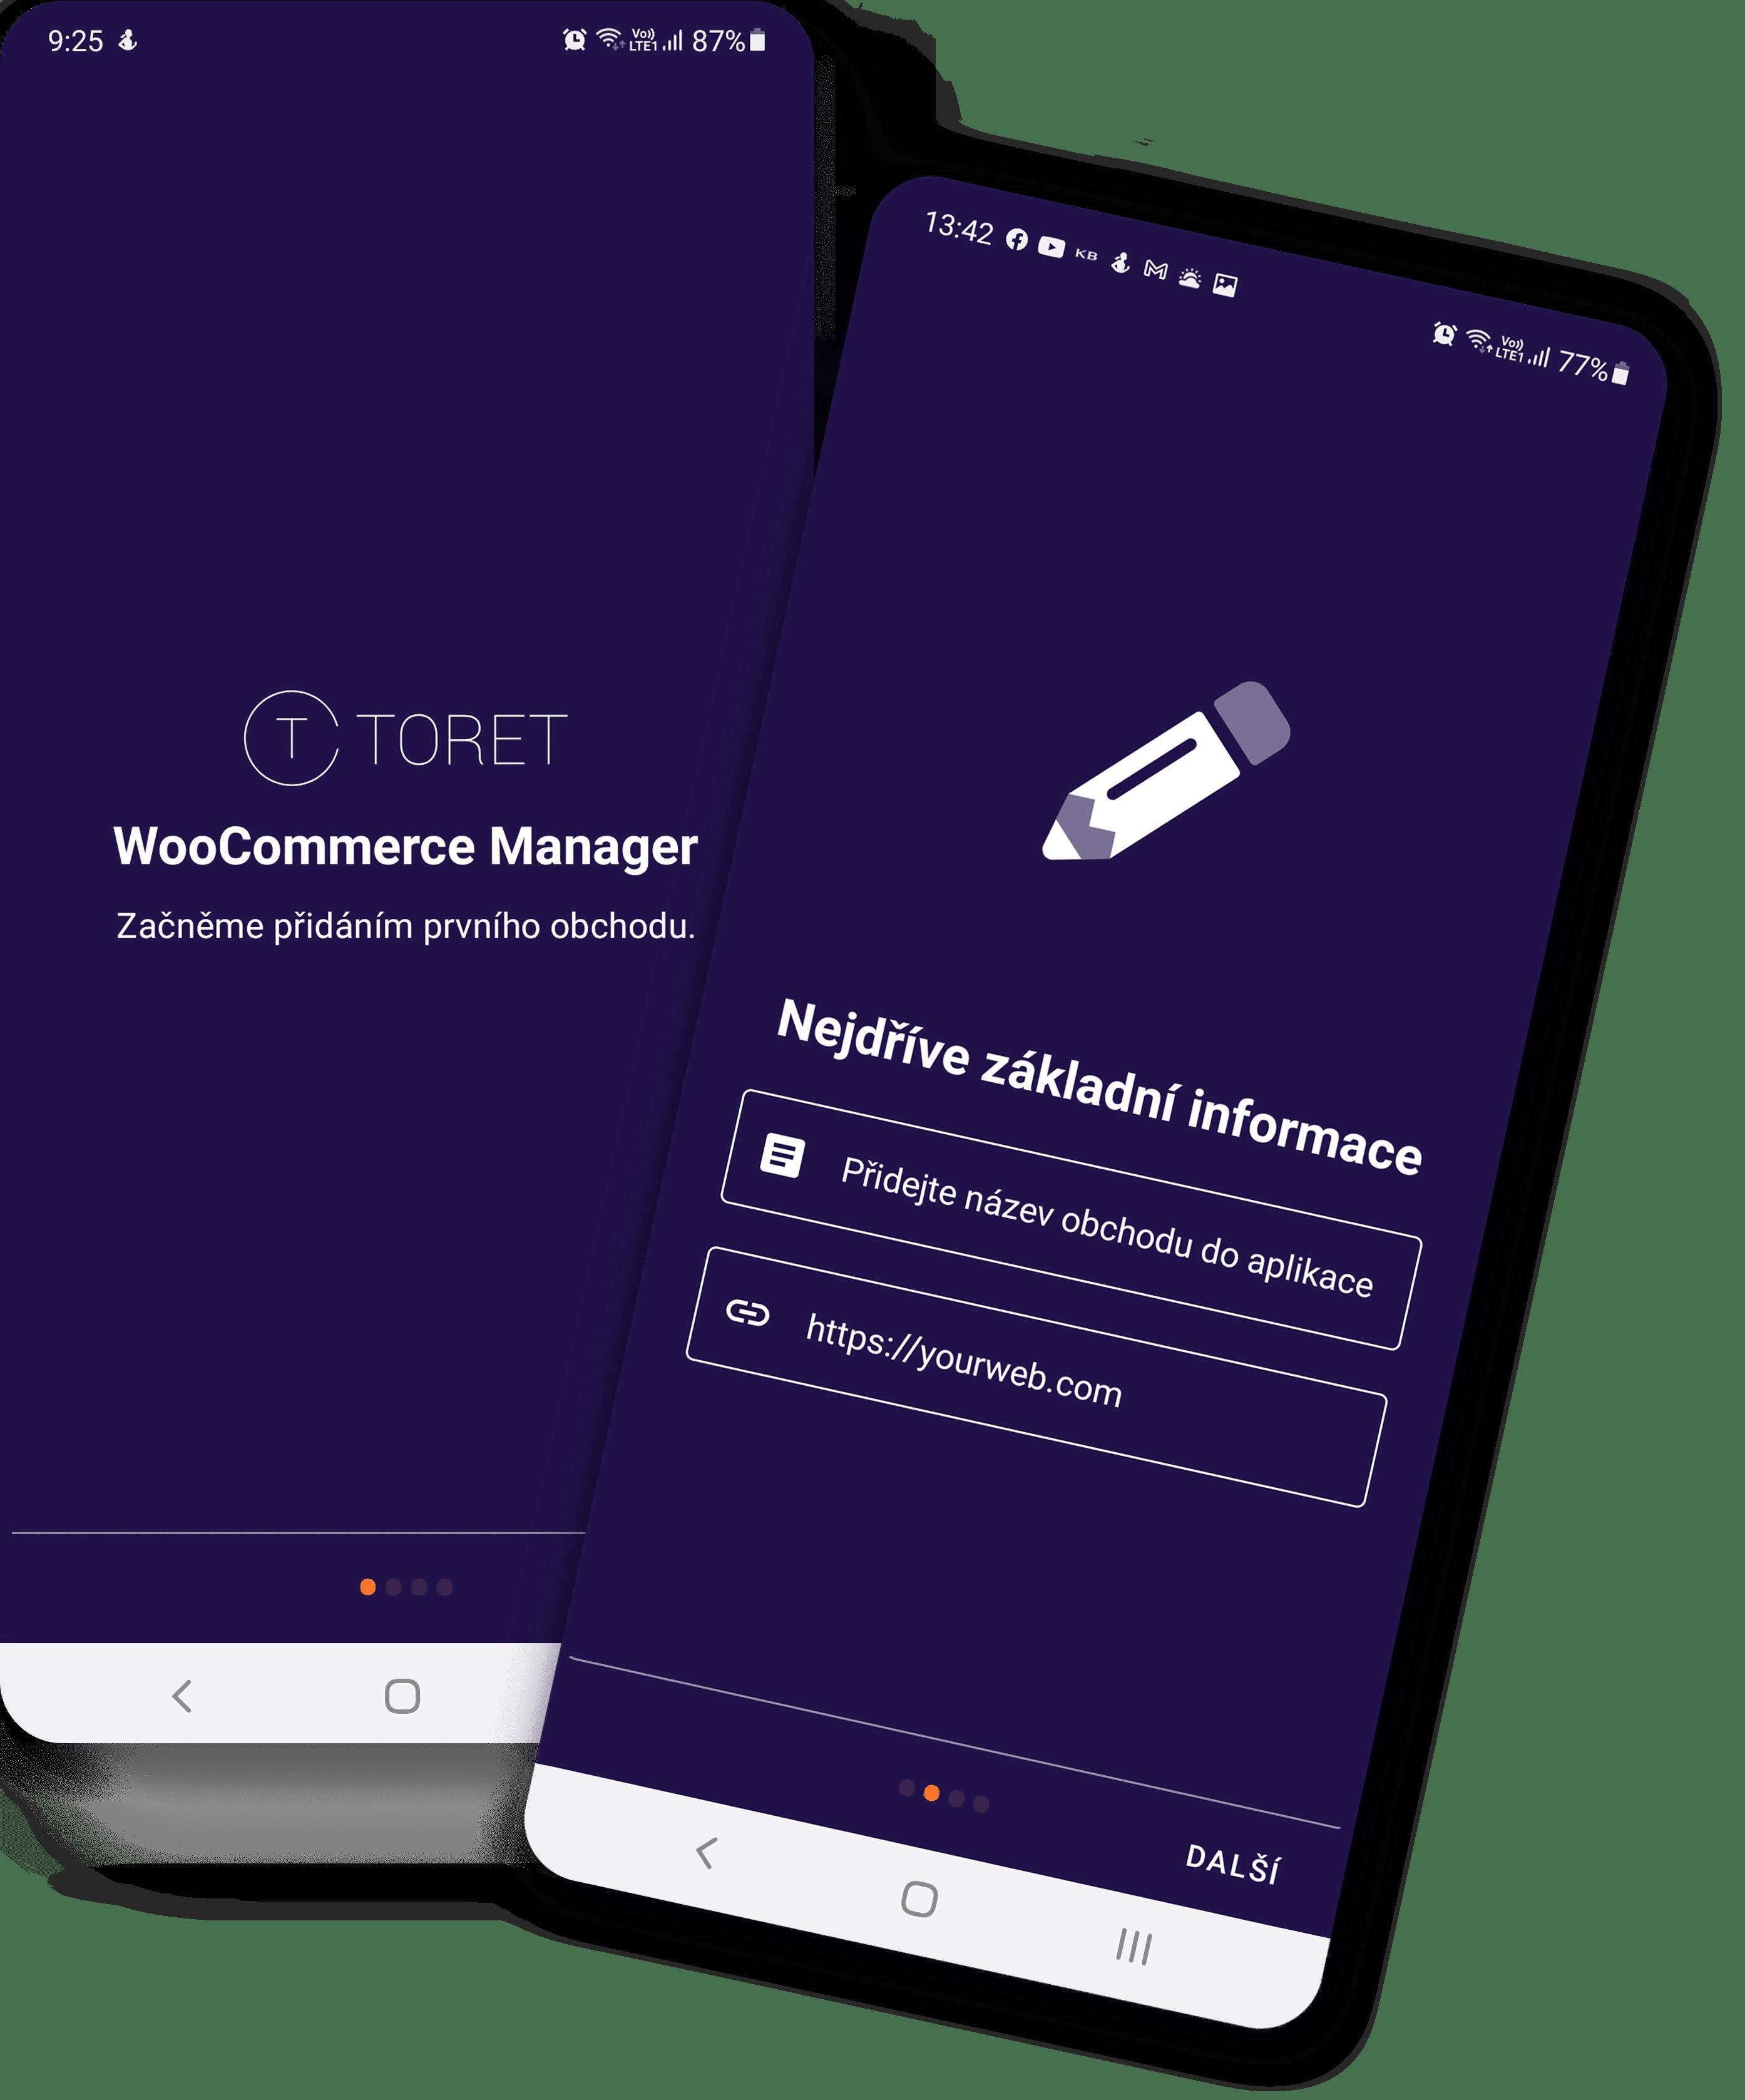 Toret WooCommerce Manager Intro 1